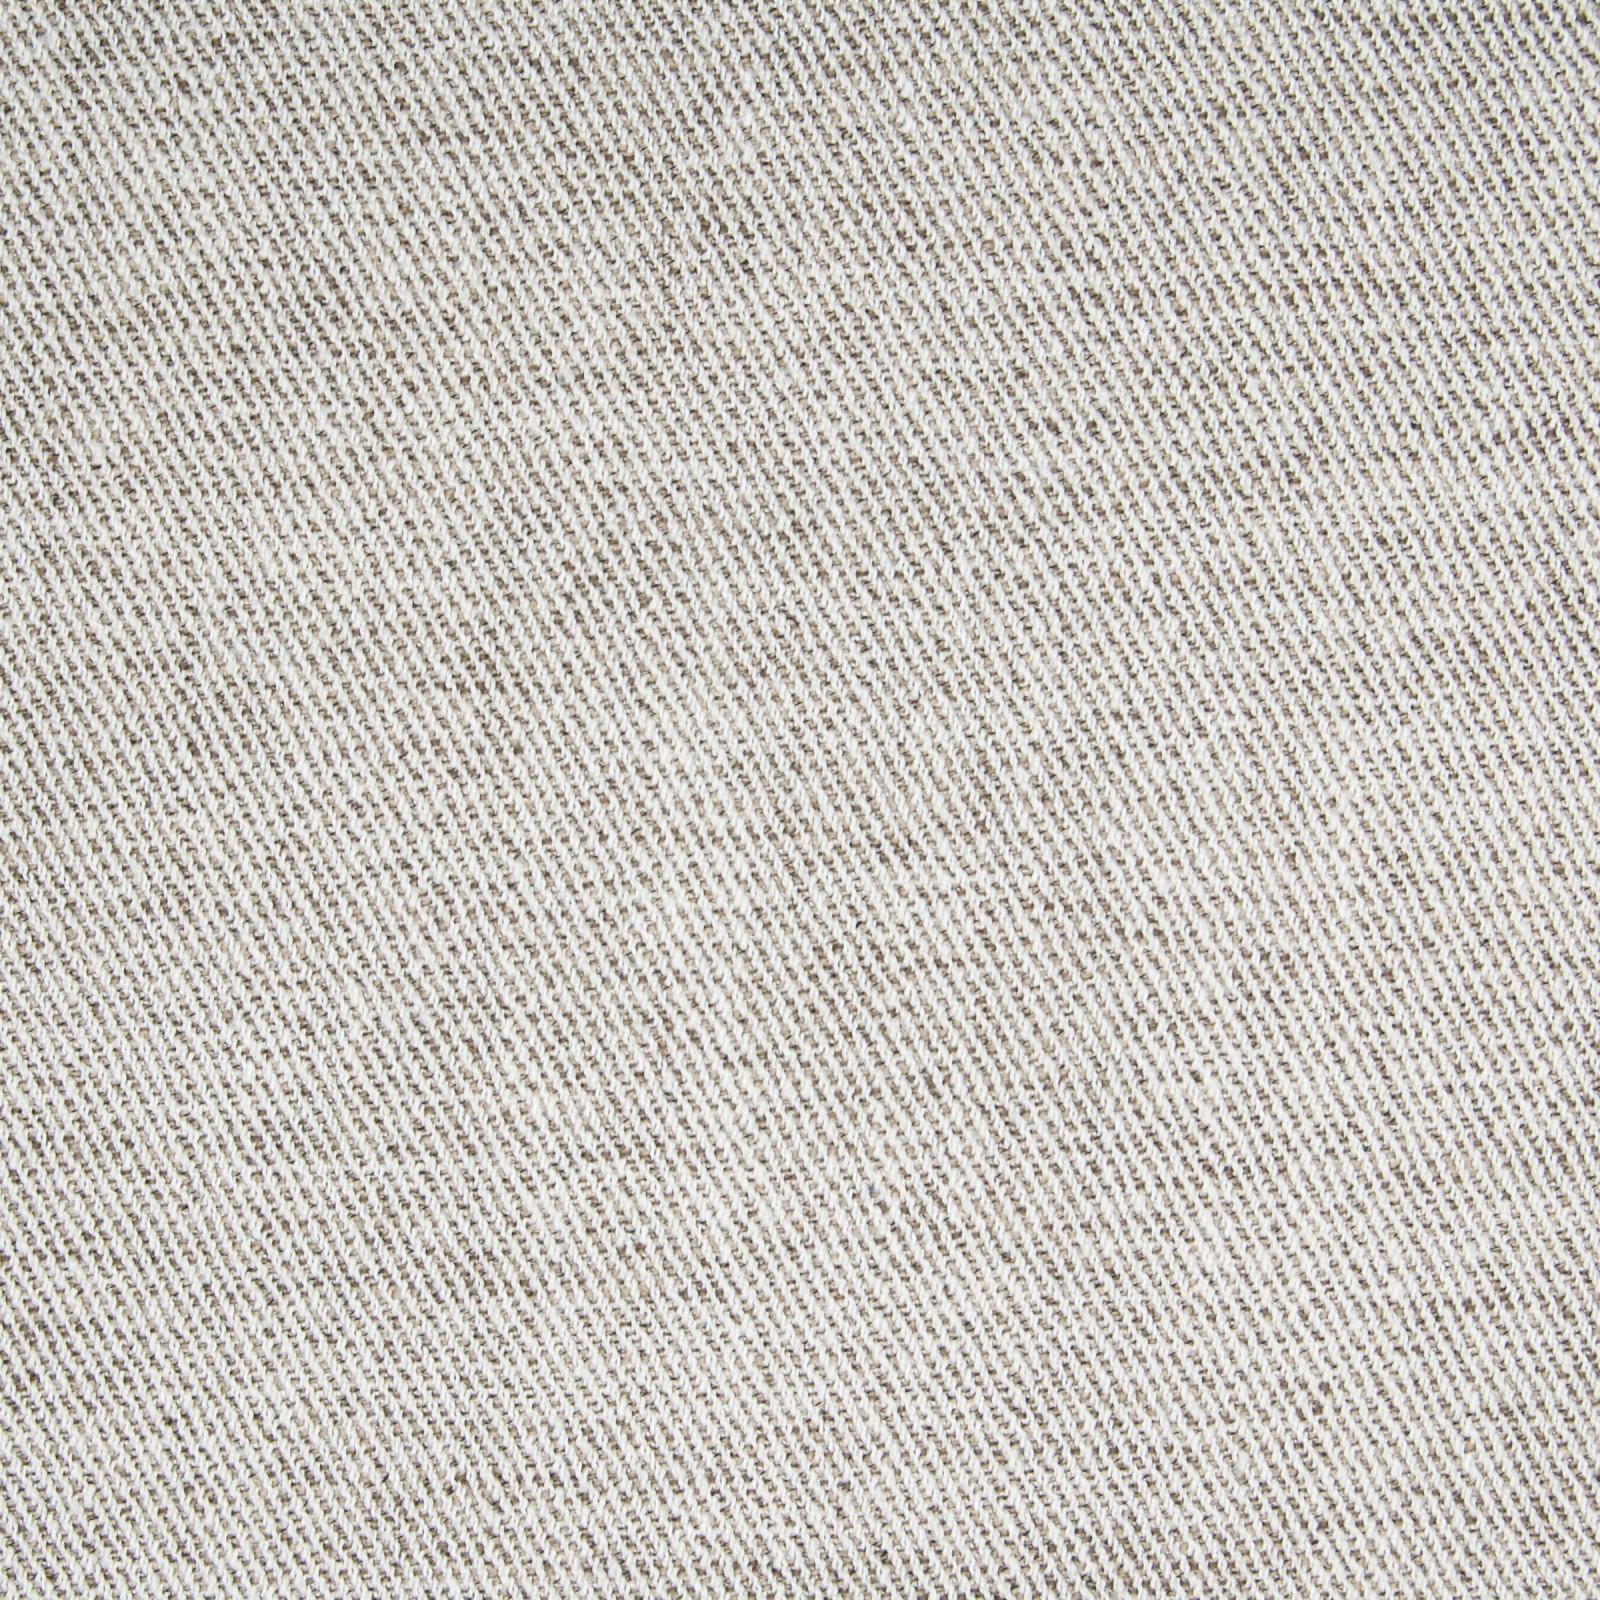 crypton fabric sofa double bed b2507 hemp | greenhouse fabrics